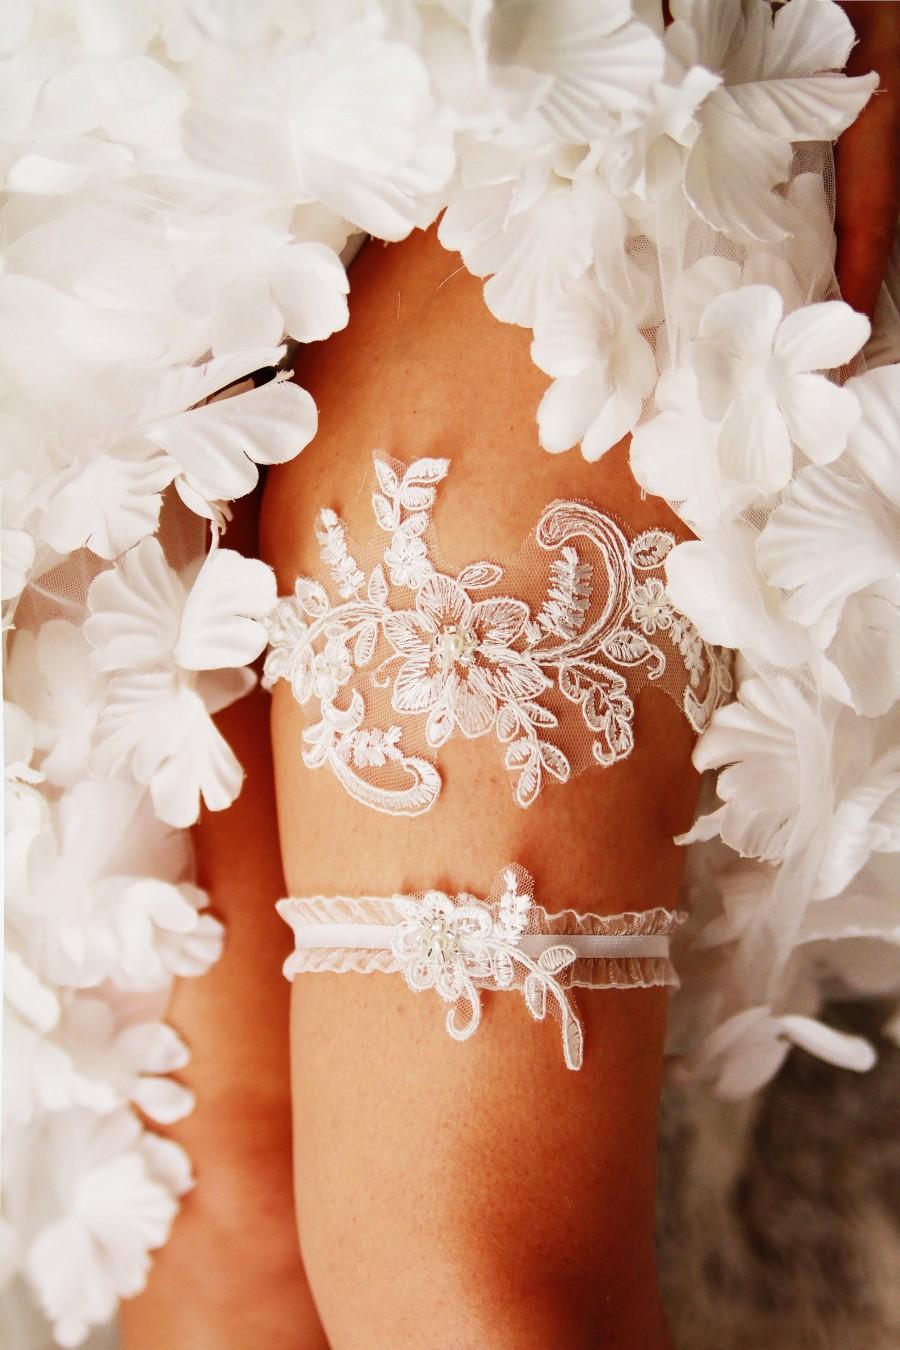 Свадьба - Wedding Garter Set Bridal Garter - Ivory Lace Garters - Keepsake Garter Toss Garter Wedding Gift Bridal Shower Gift Vintage Inspired Garter